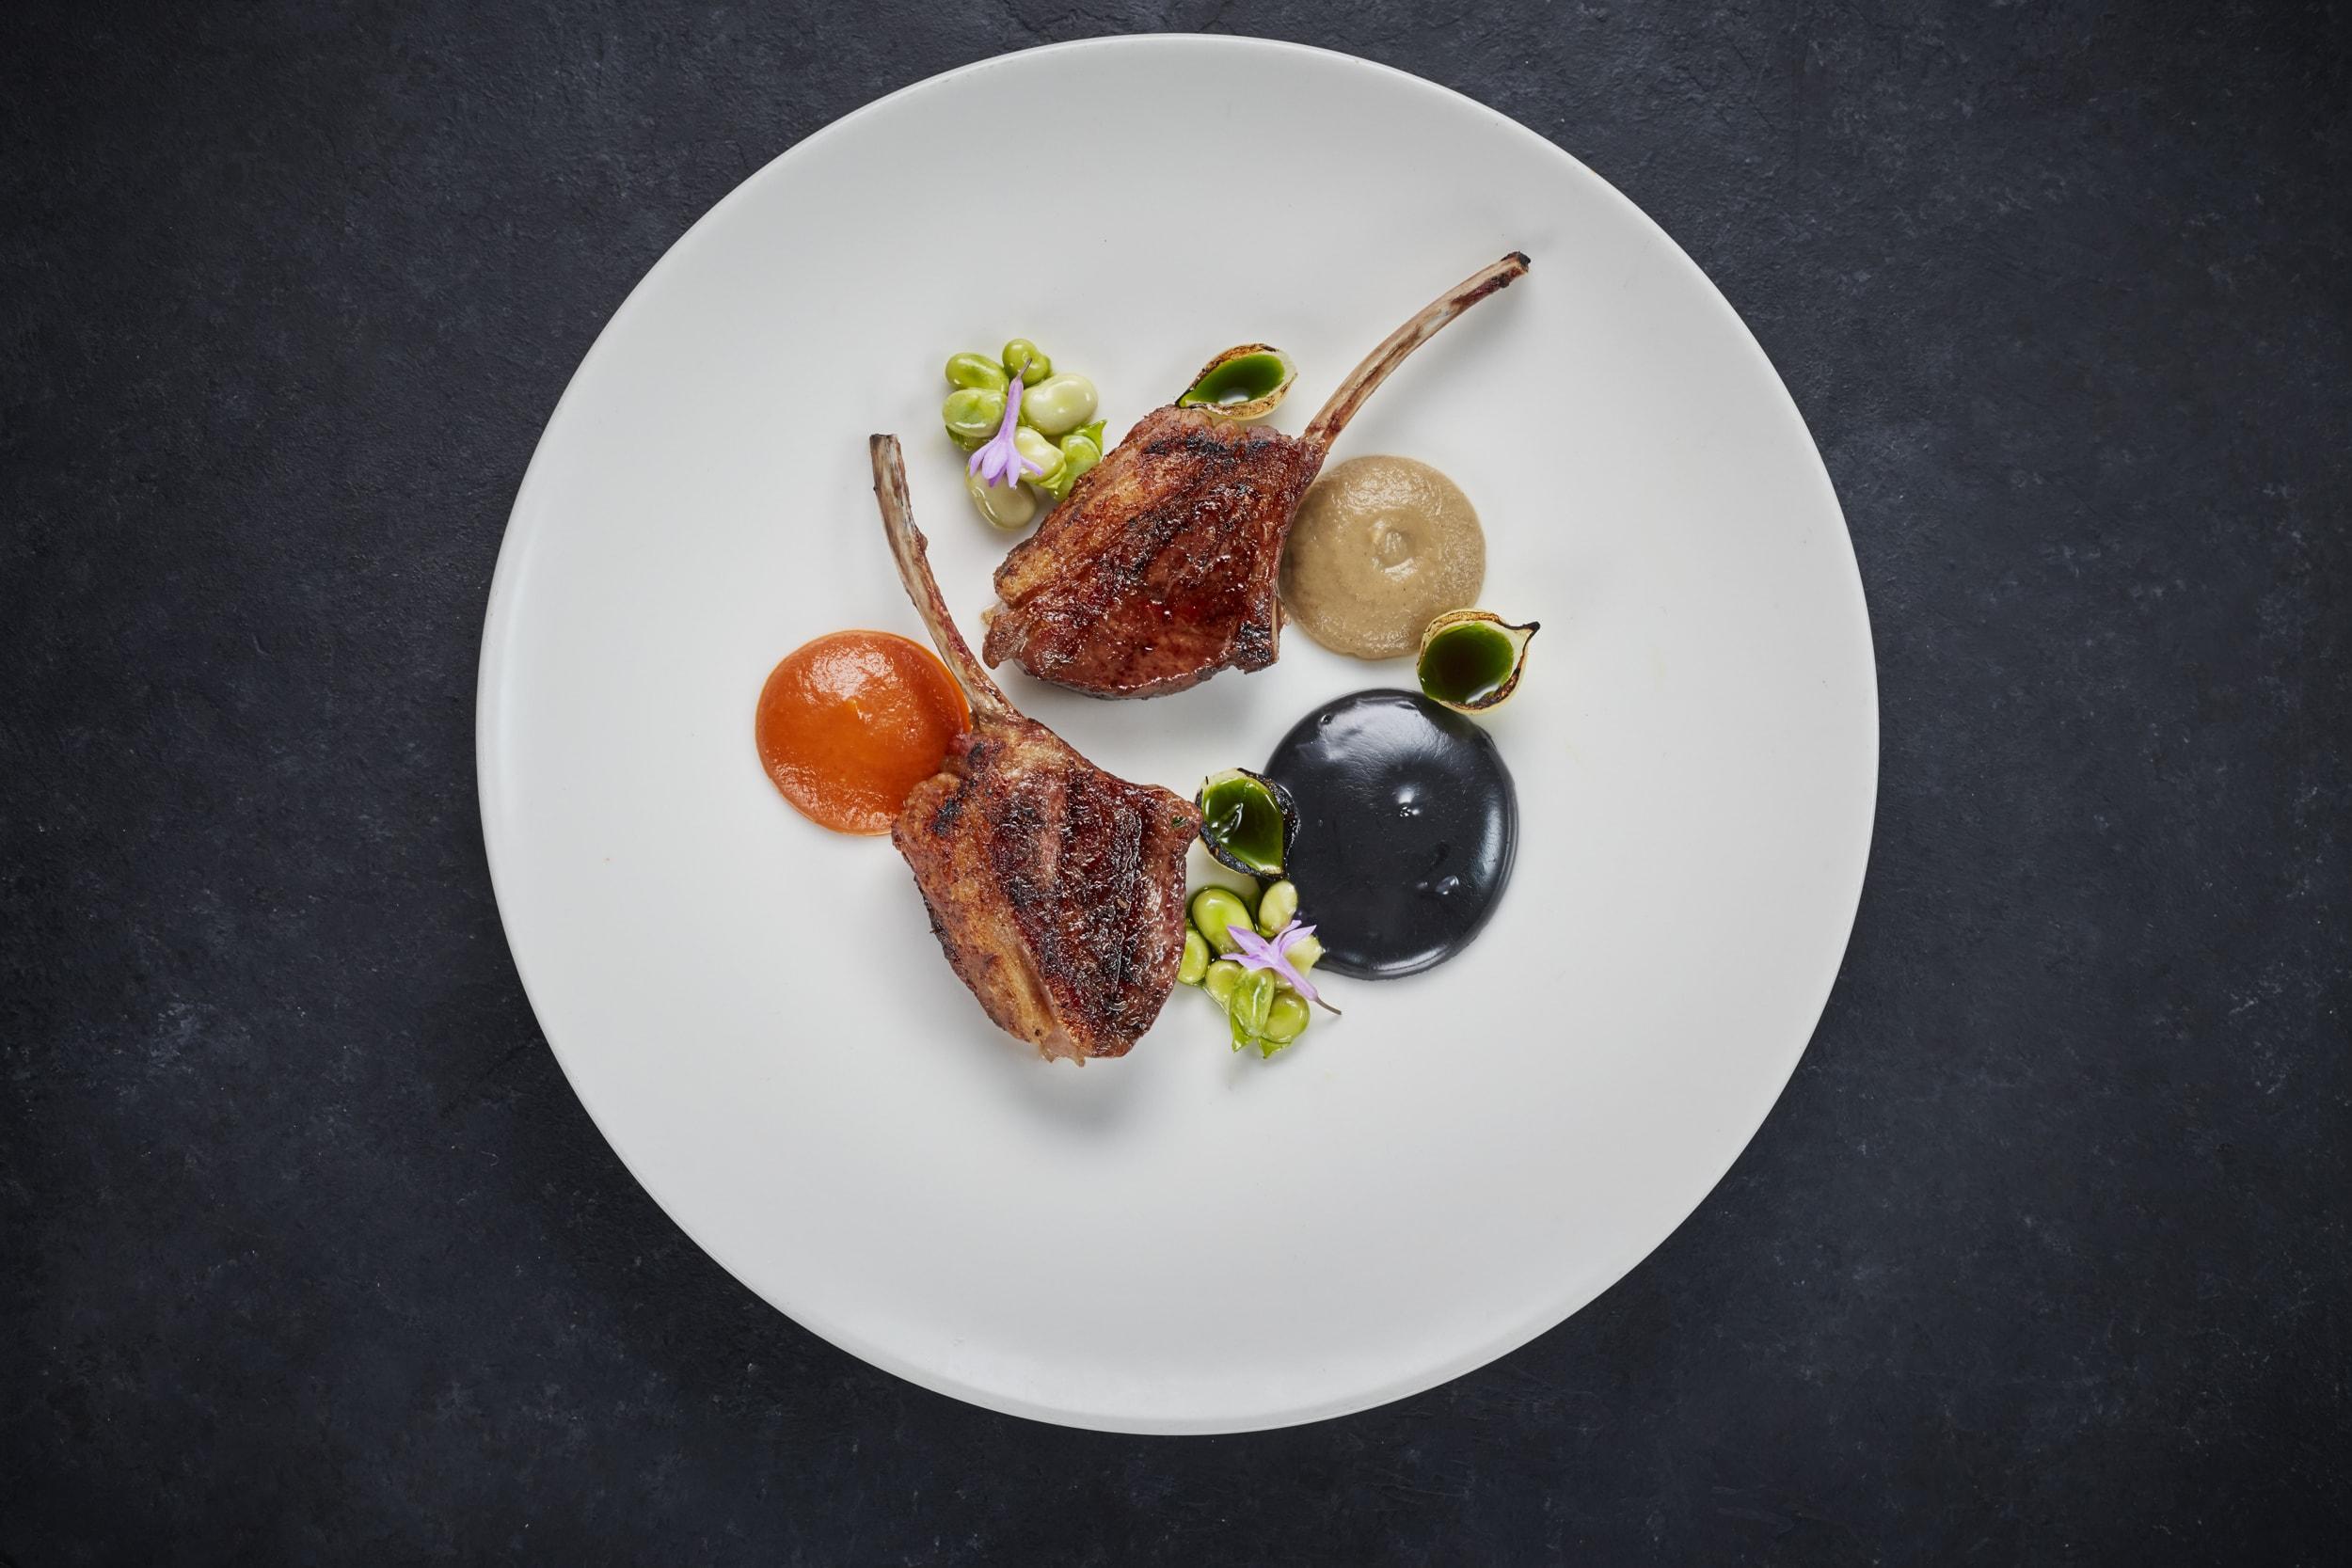 170404_MRestaurant_Lamb_09-min.jpg